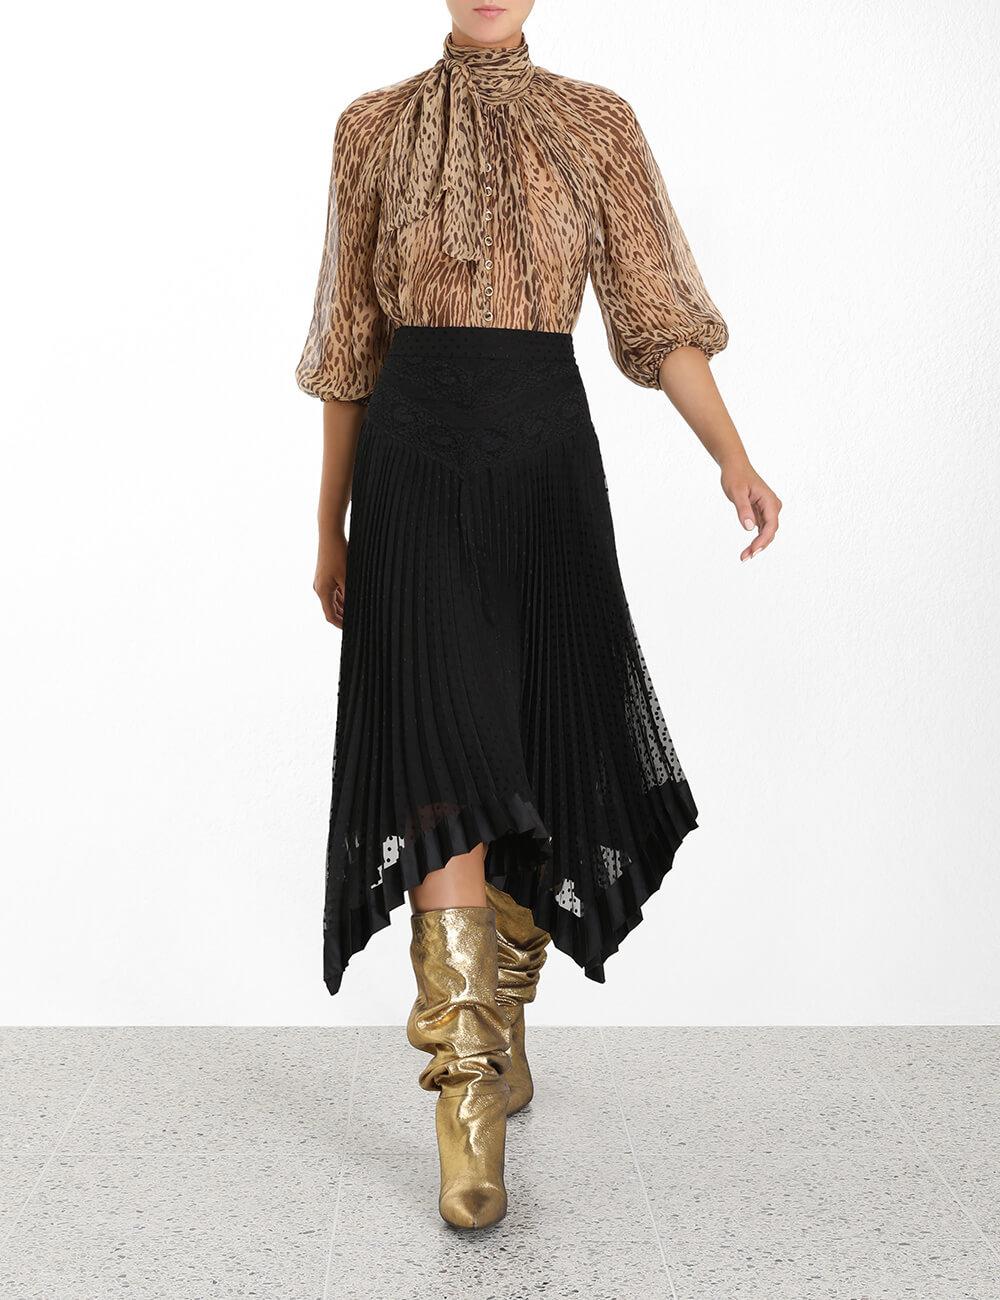 Espionage Lace Panelled Skirt